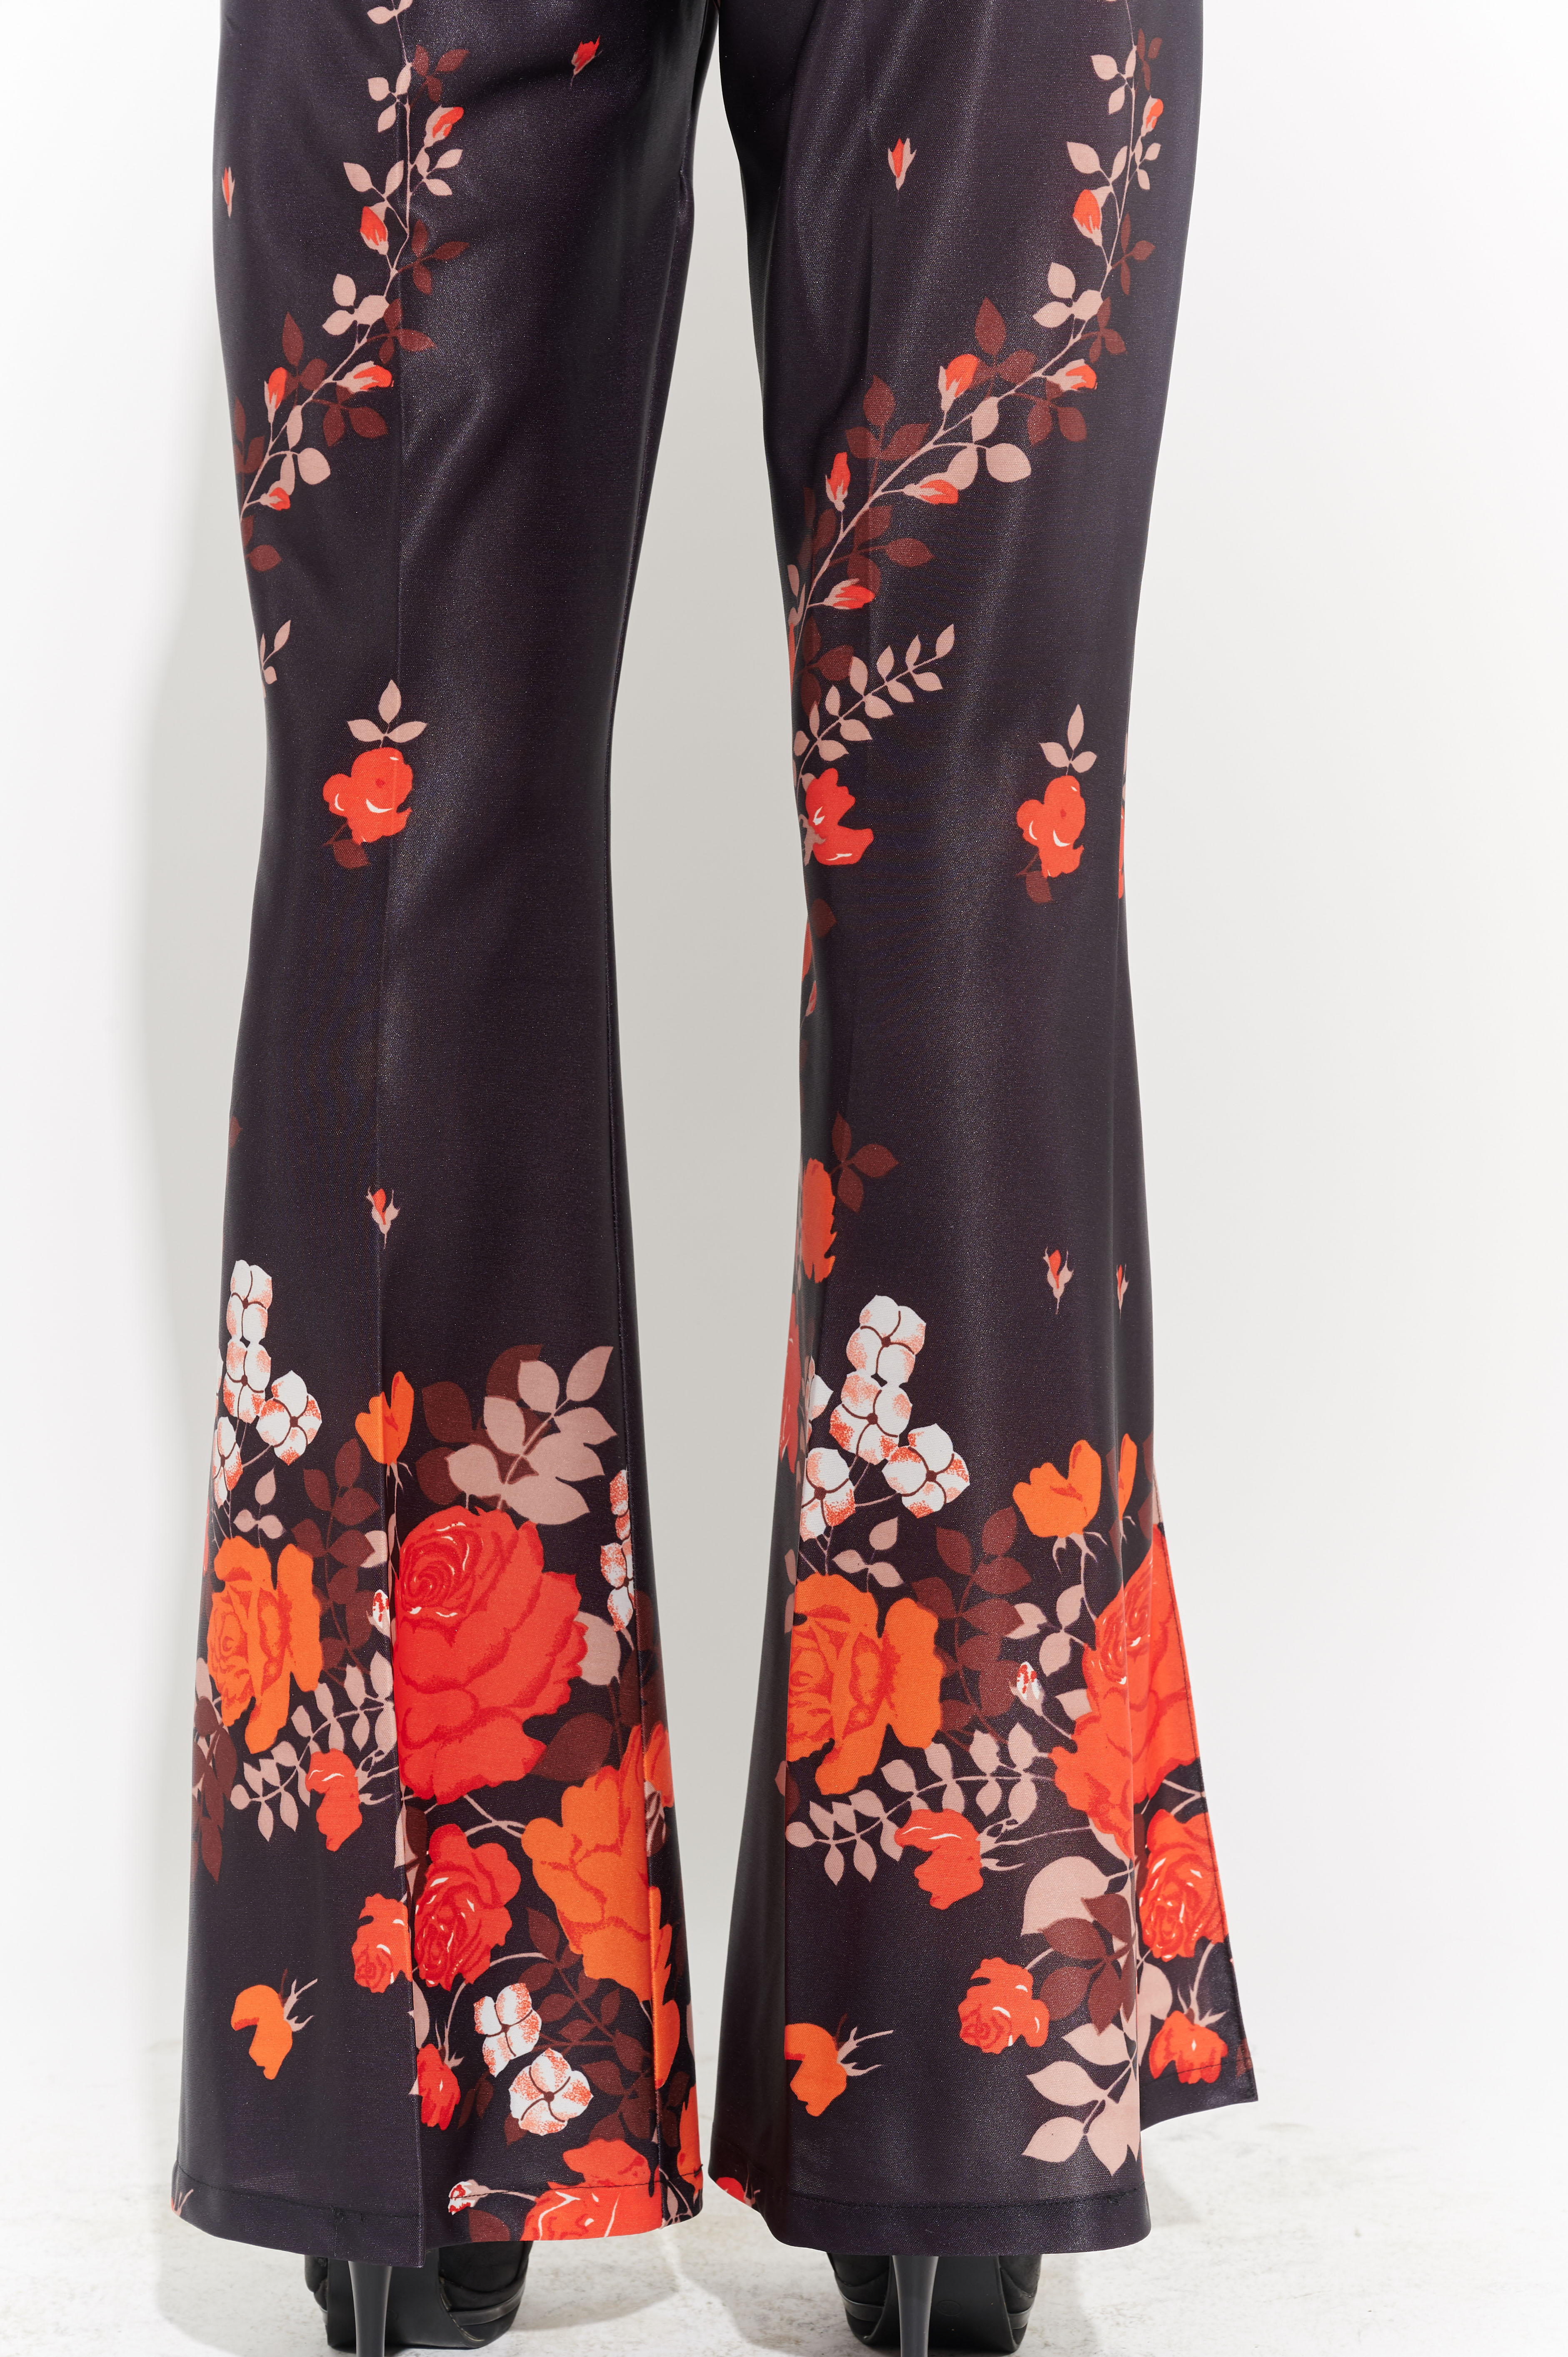 Çiçek motifli pantolon